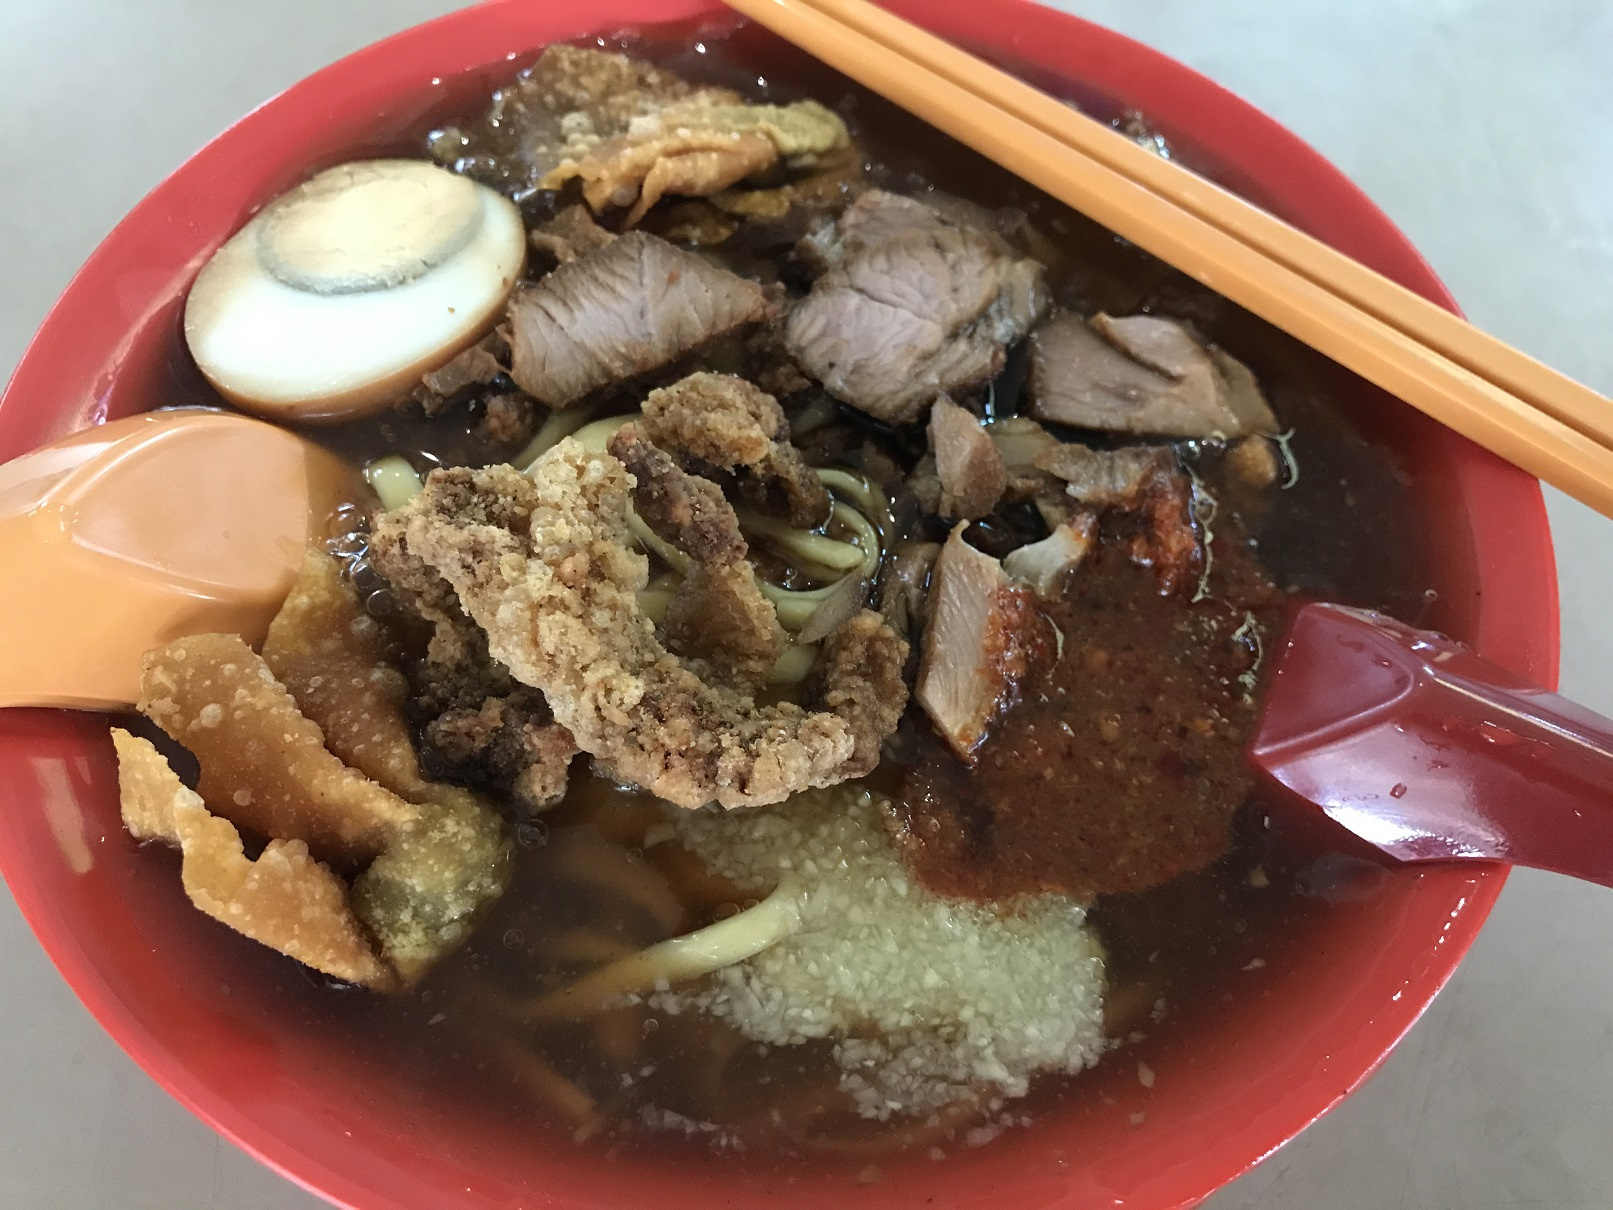 Lunch is my favorite lor mee!